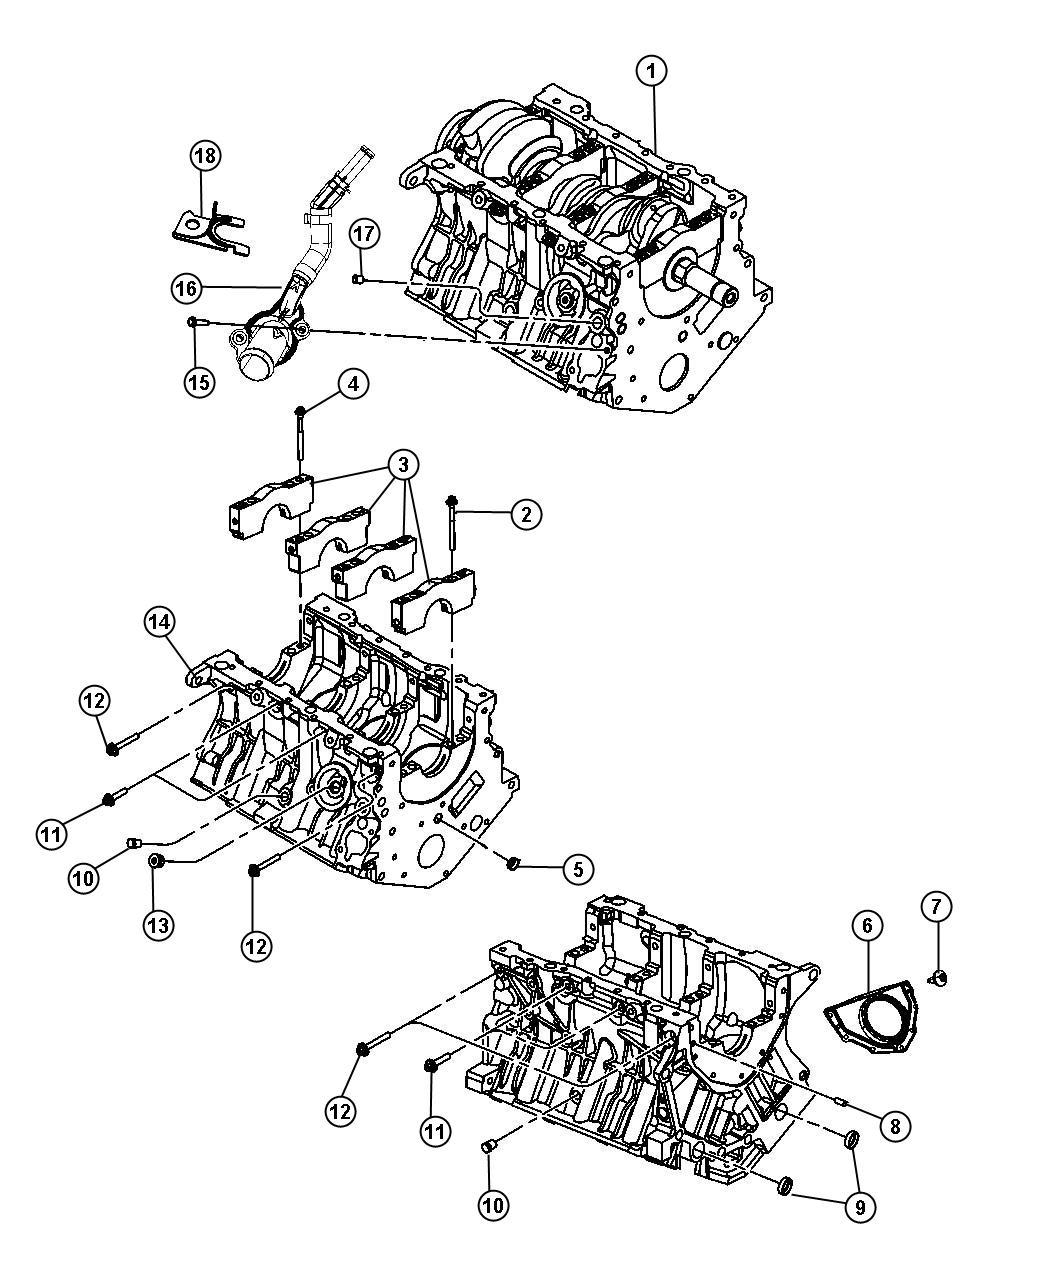 Chrysler 300 Engine. Short block. All wheel drive, awd